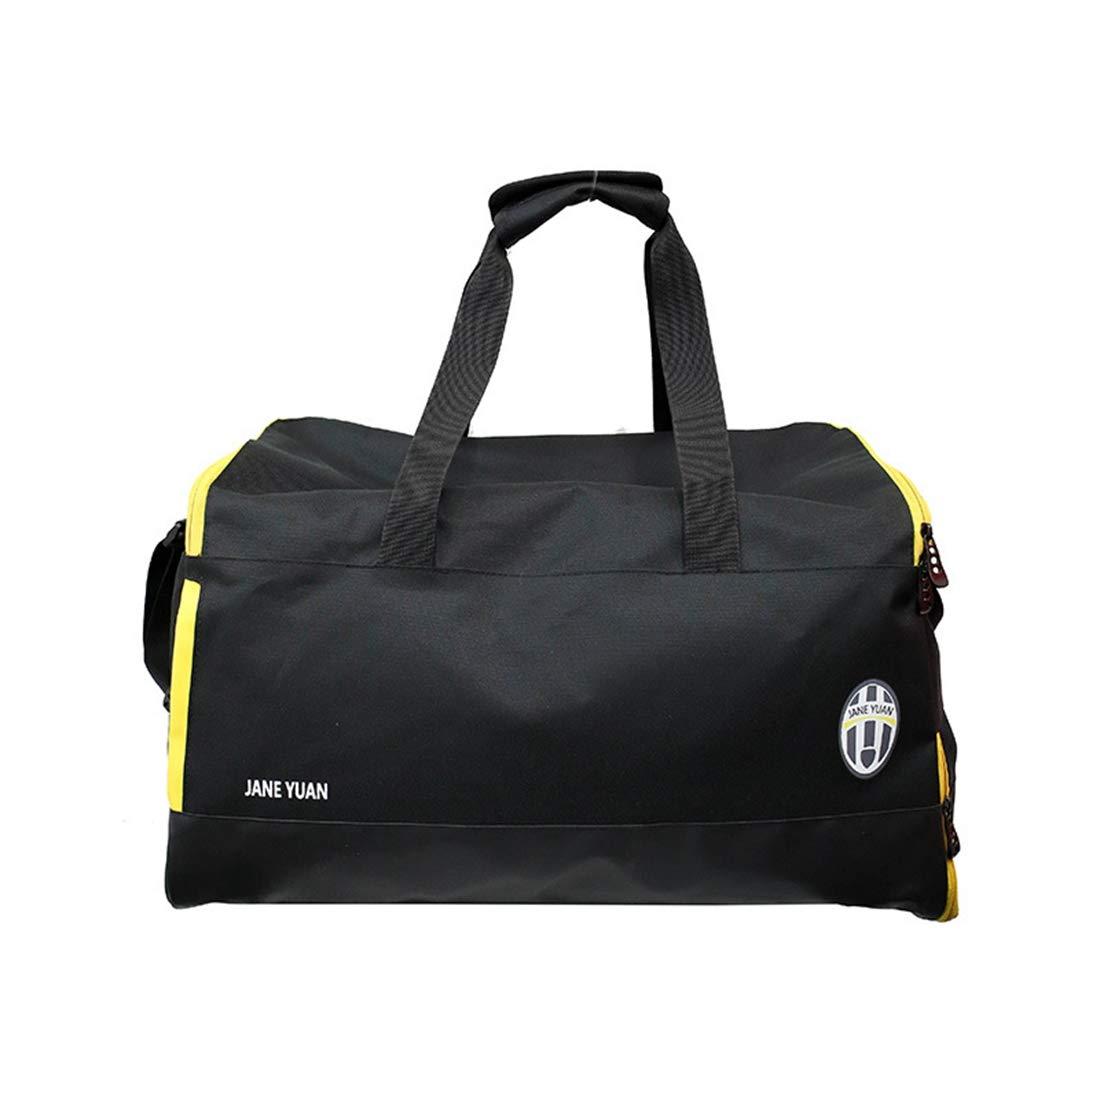 RABILTY Short Trip Package Female Hand-held Gym Bag Sports Bag Waterproof Shoulder Bag Large Capacity Bag Color : Black